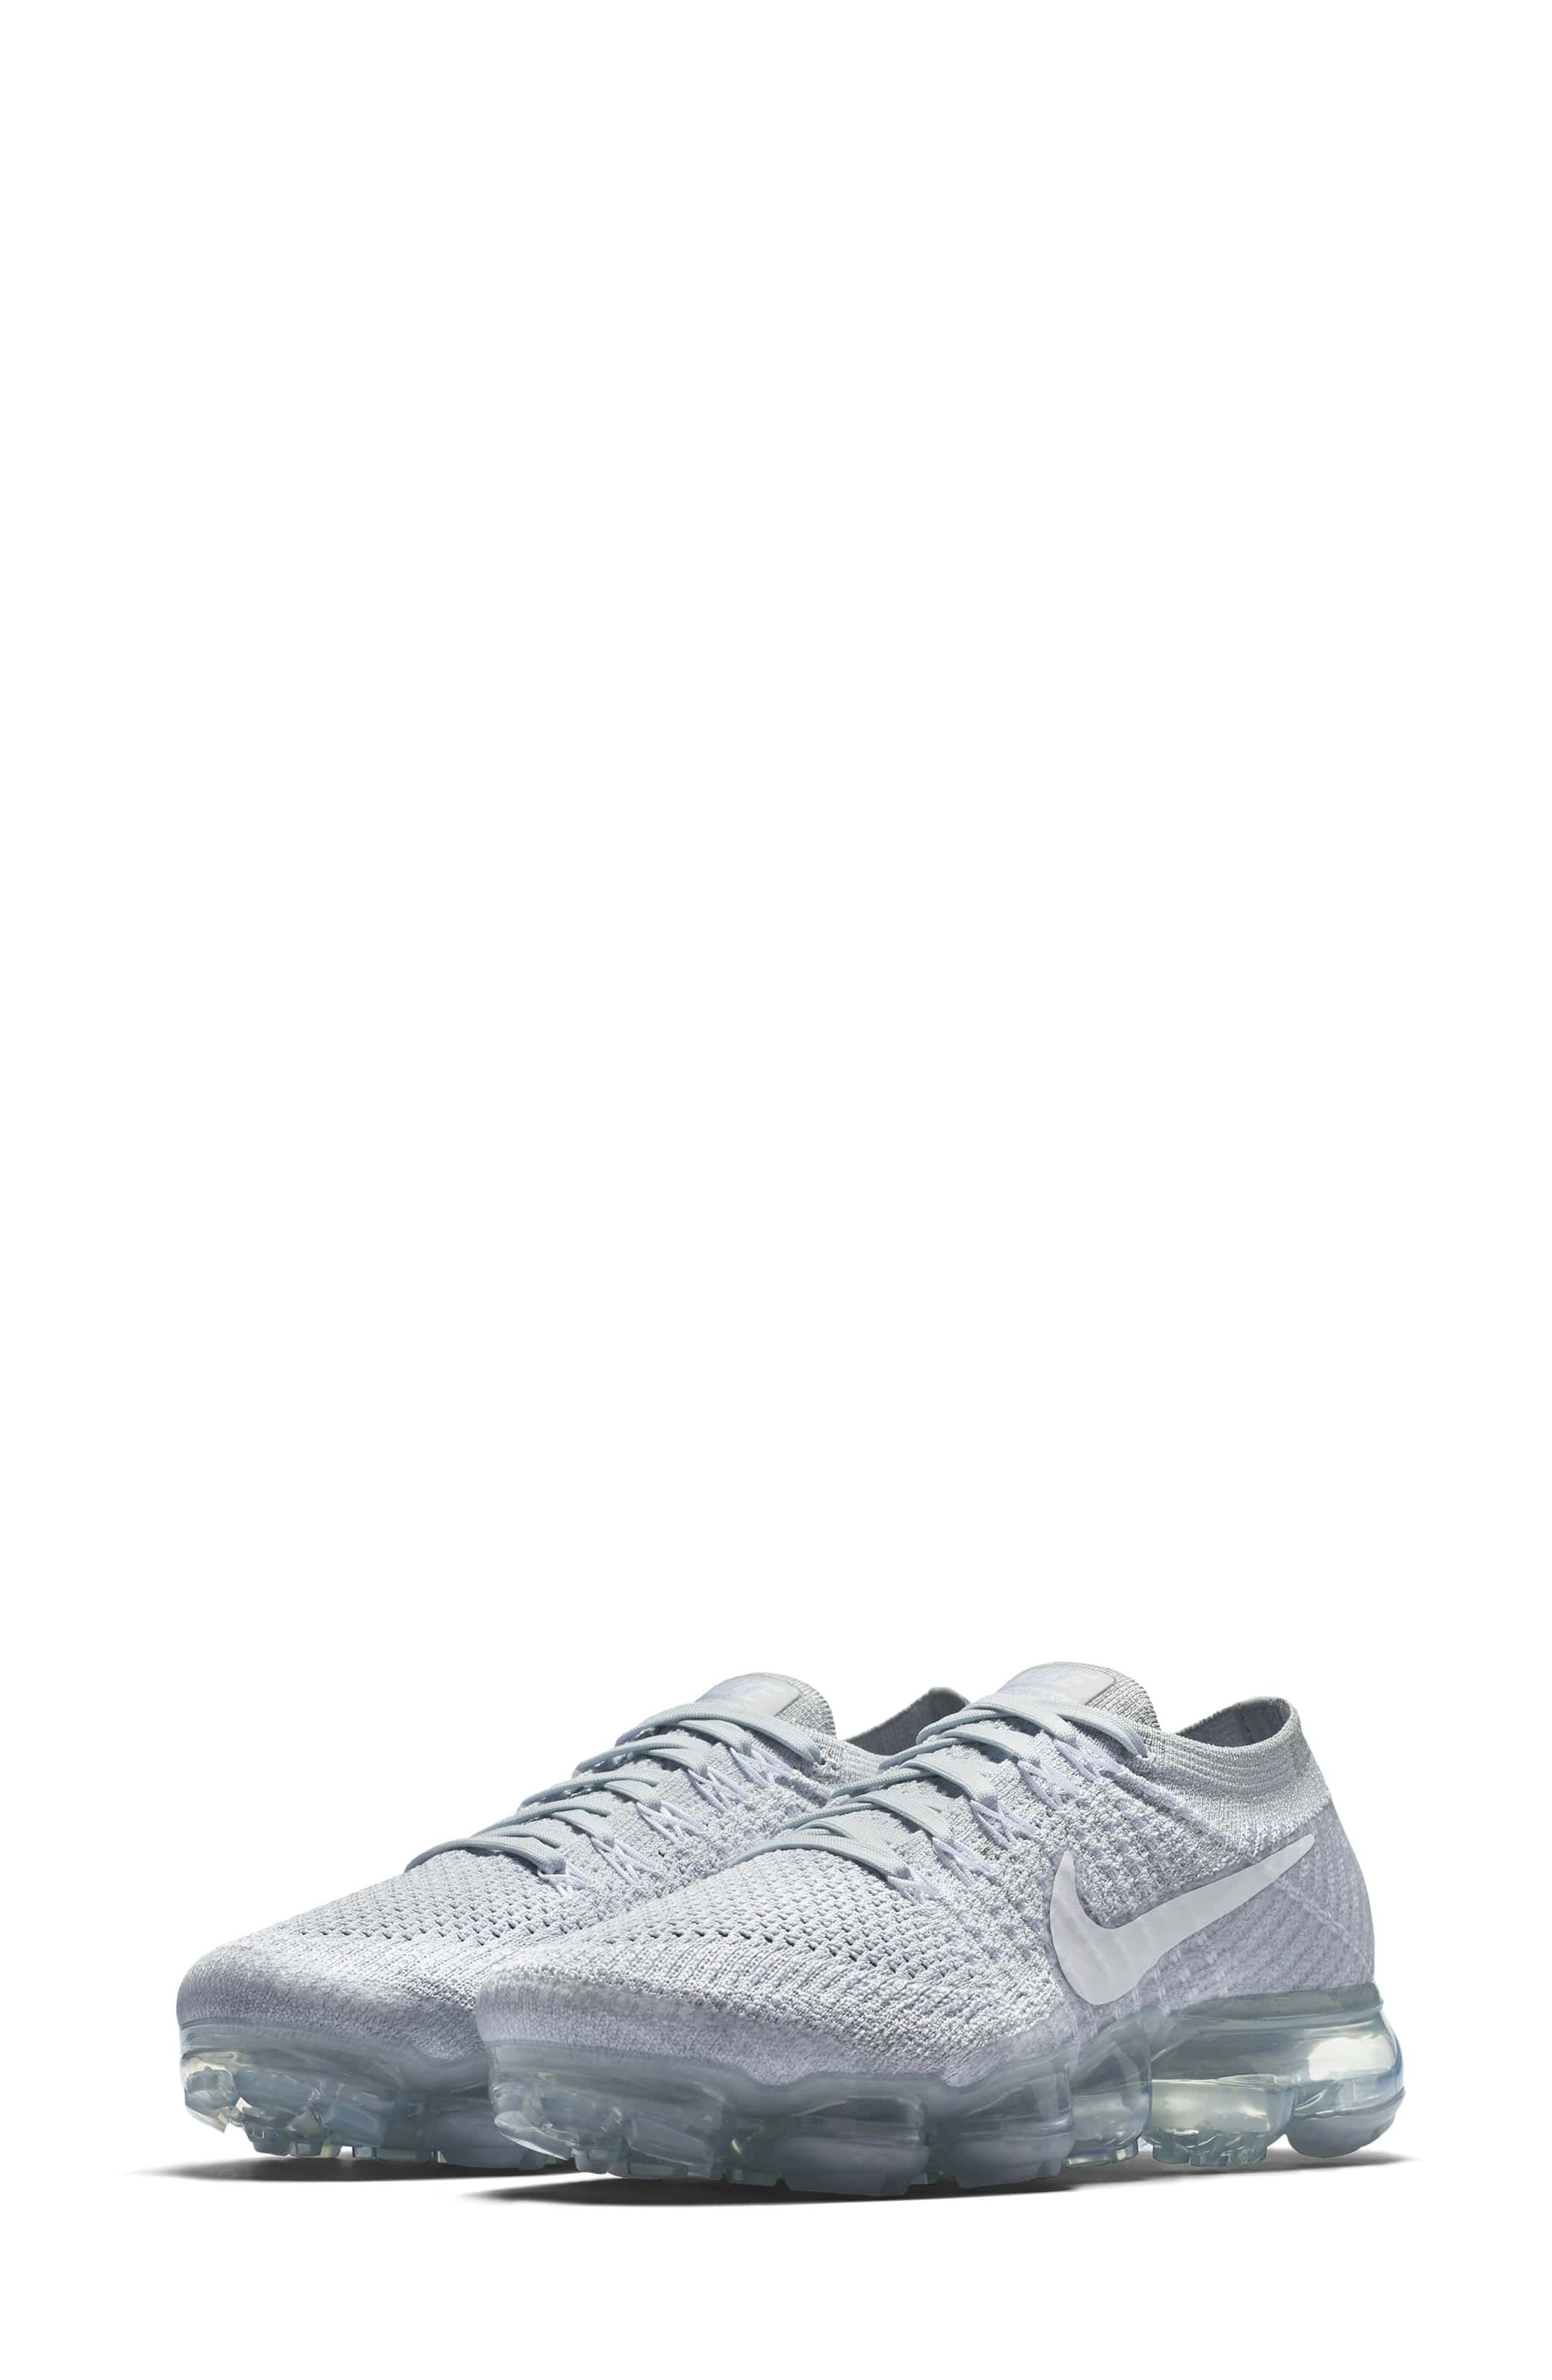 Alternate Image 1 Selected - Nike Air VaporMax Flyknit Running Shoe (Women)